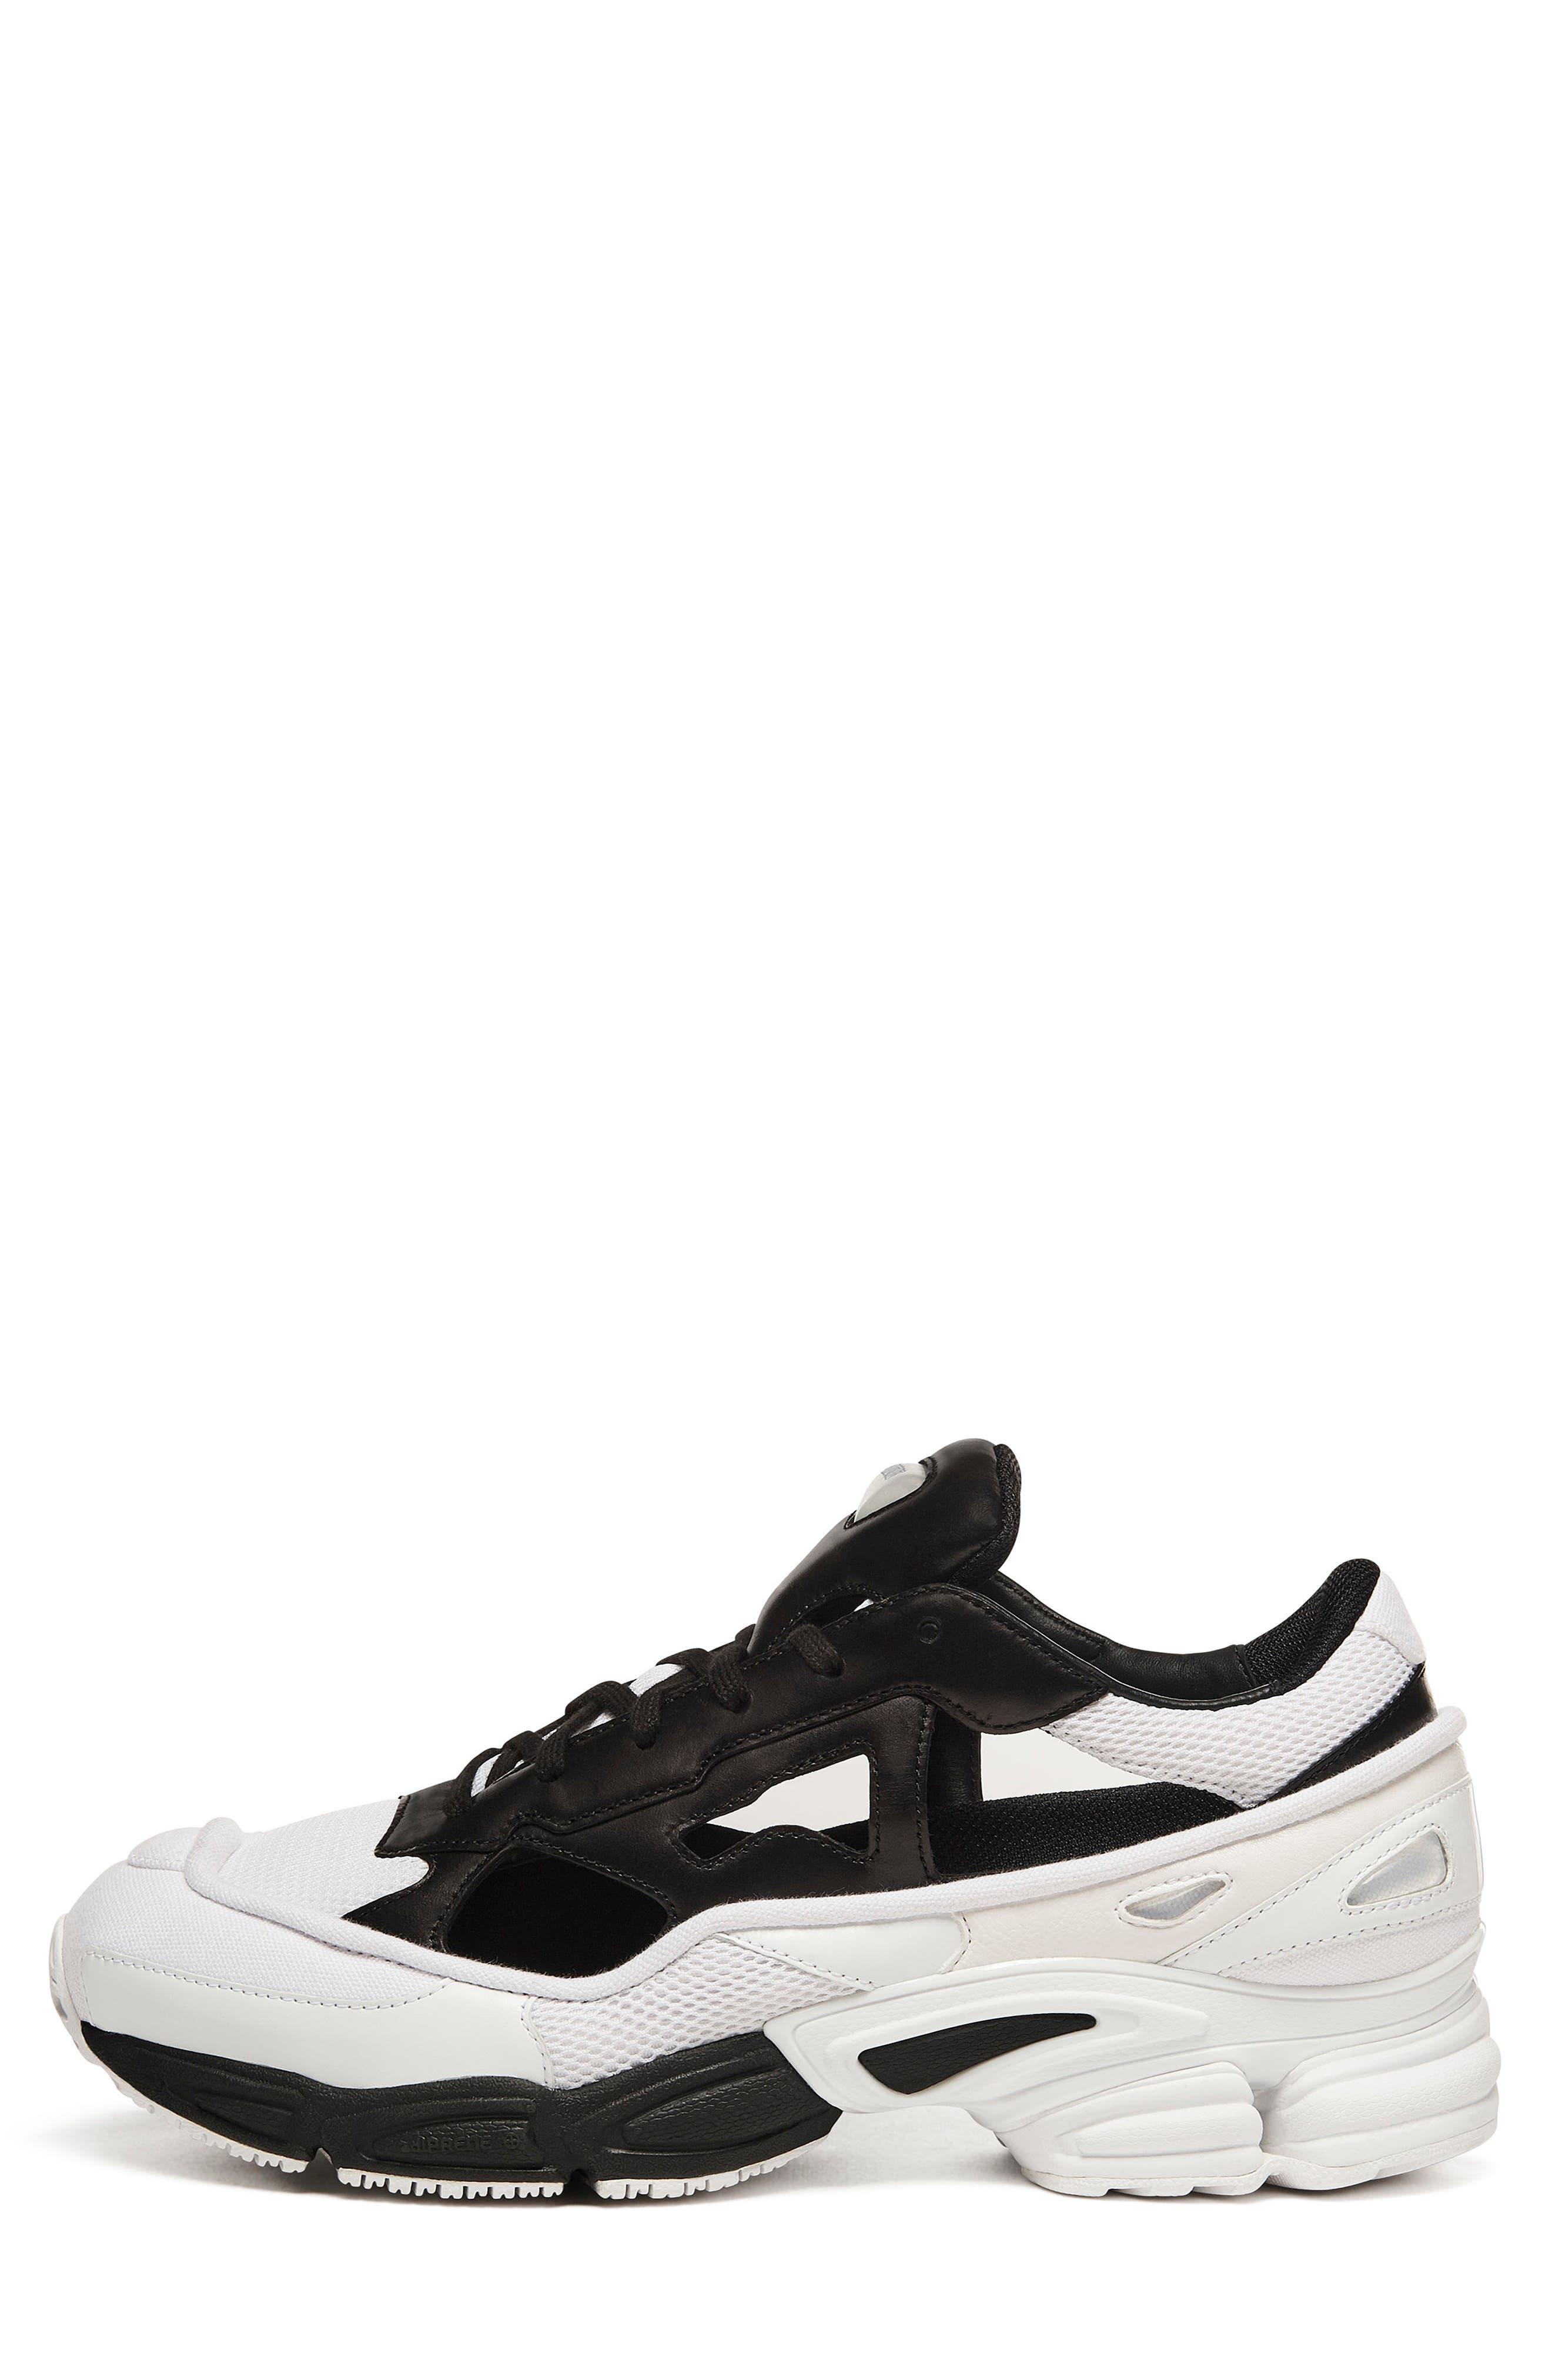 adidas x Raf Simons Replicant Ozweego Sneaker,                             Main thumbnail 1, color,                             Core Black/ Cream White/ White